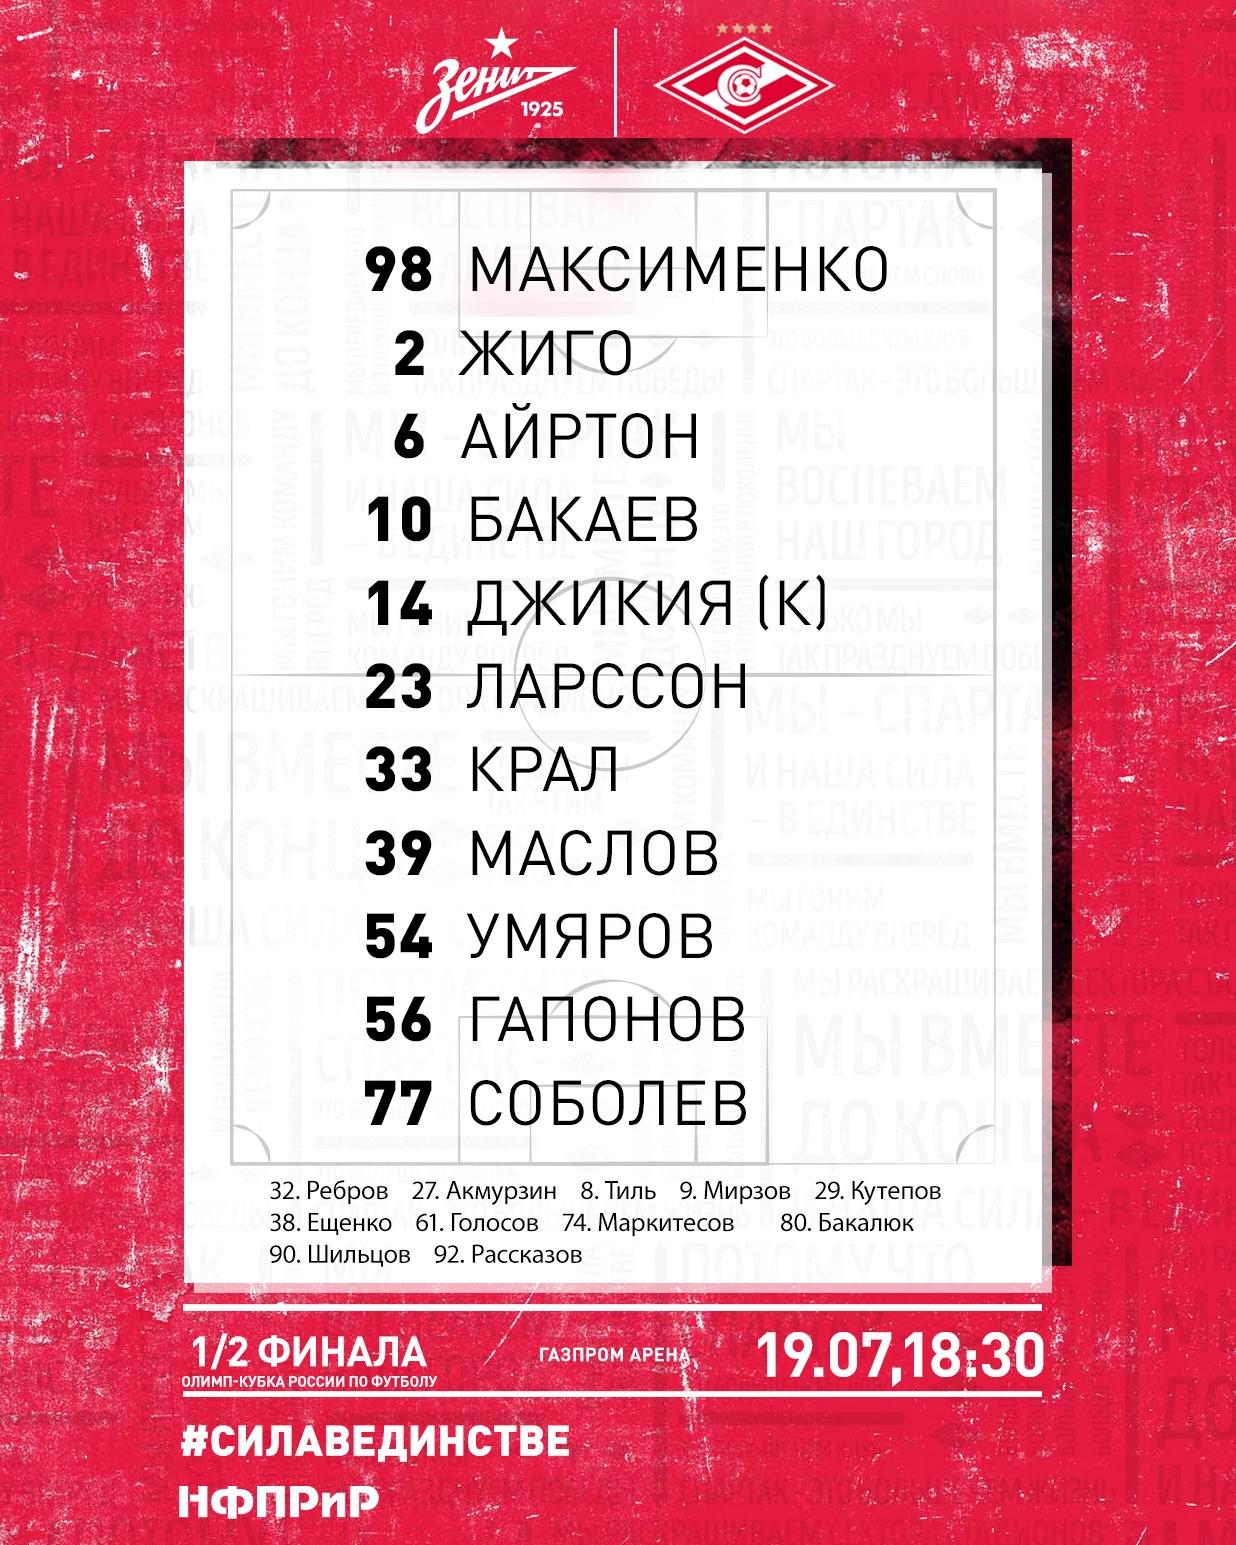 Состав «Спартака» на матч 1/2 финала Кубка России с «Зенитом»